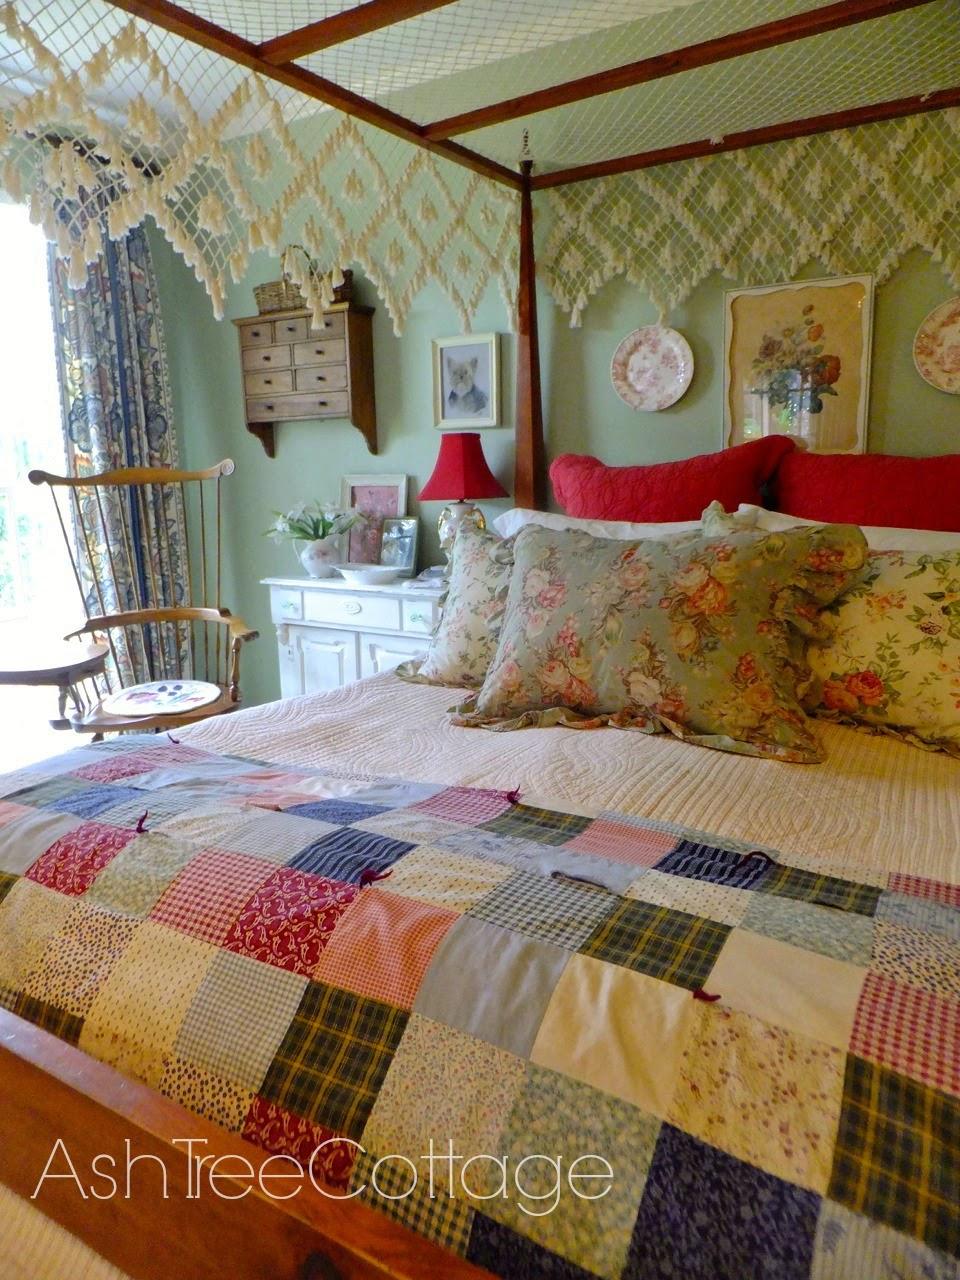 Ash Tree Cottage Let S Talk Granny Chic